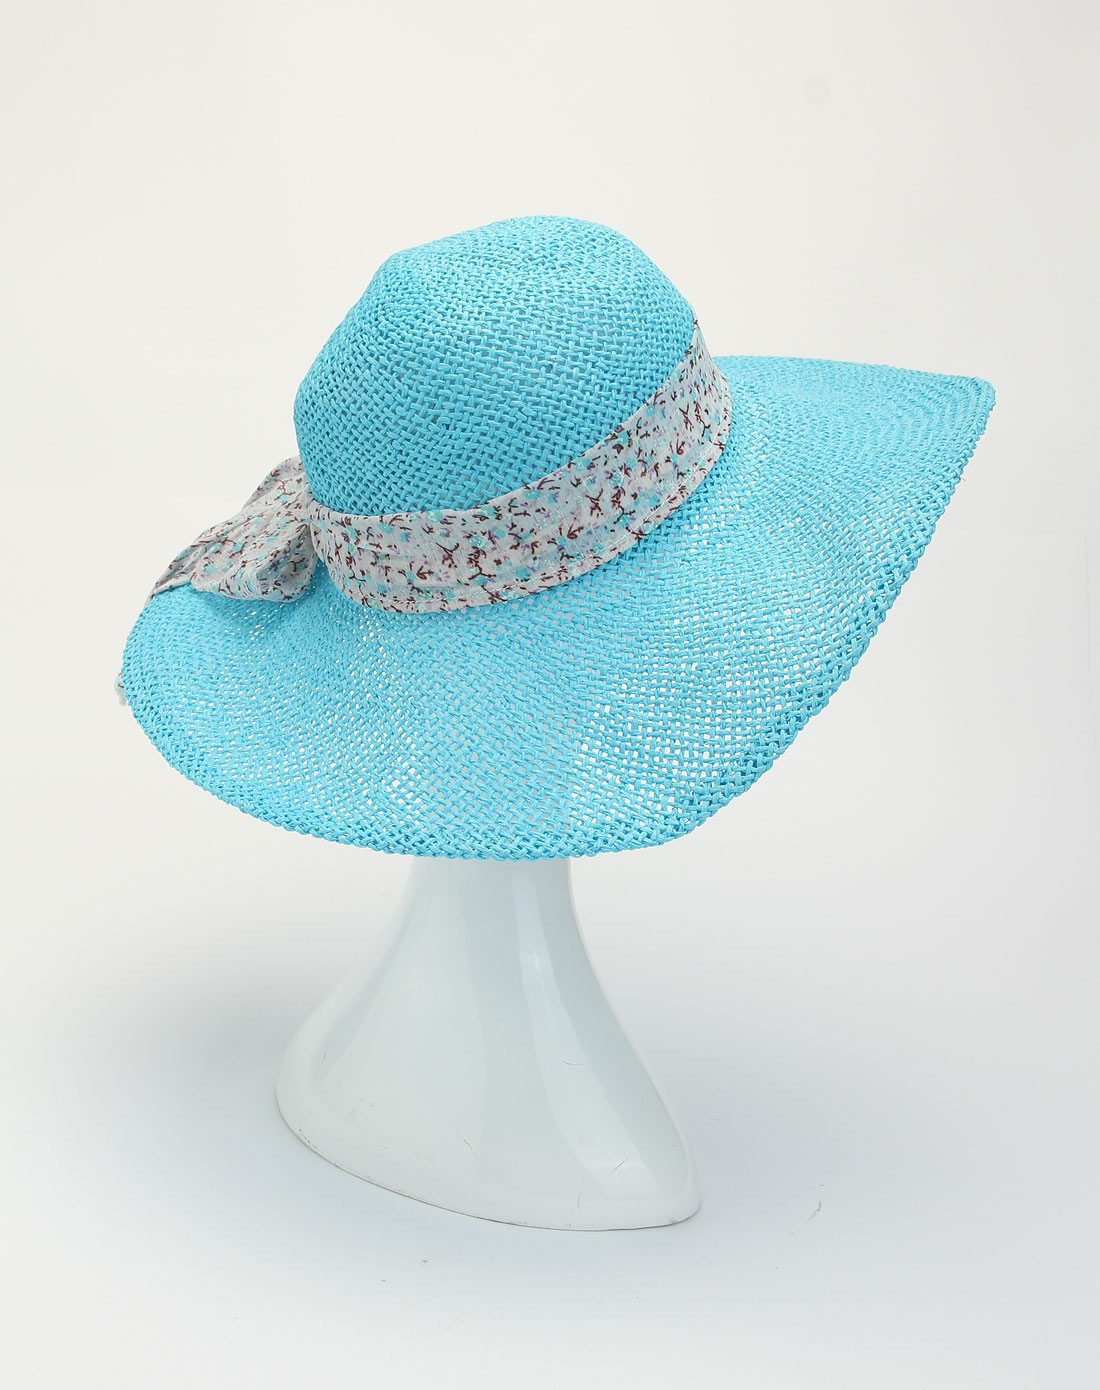 city蓝色纯手工编制时尚帽子hctm1221019022